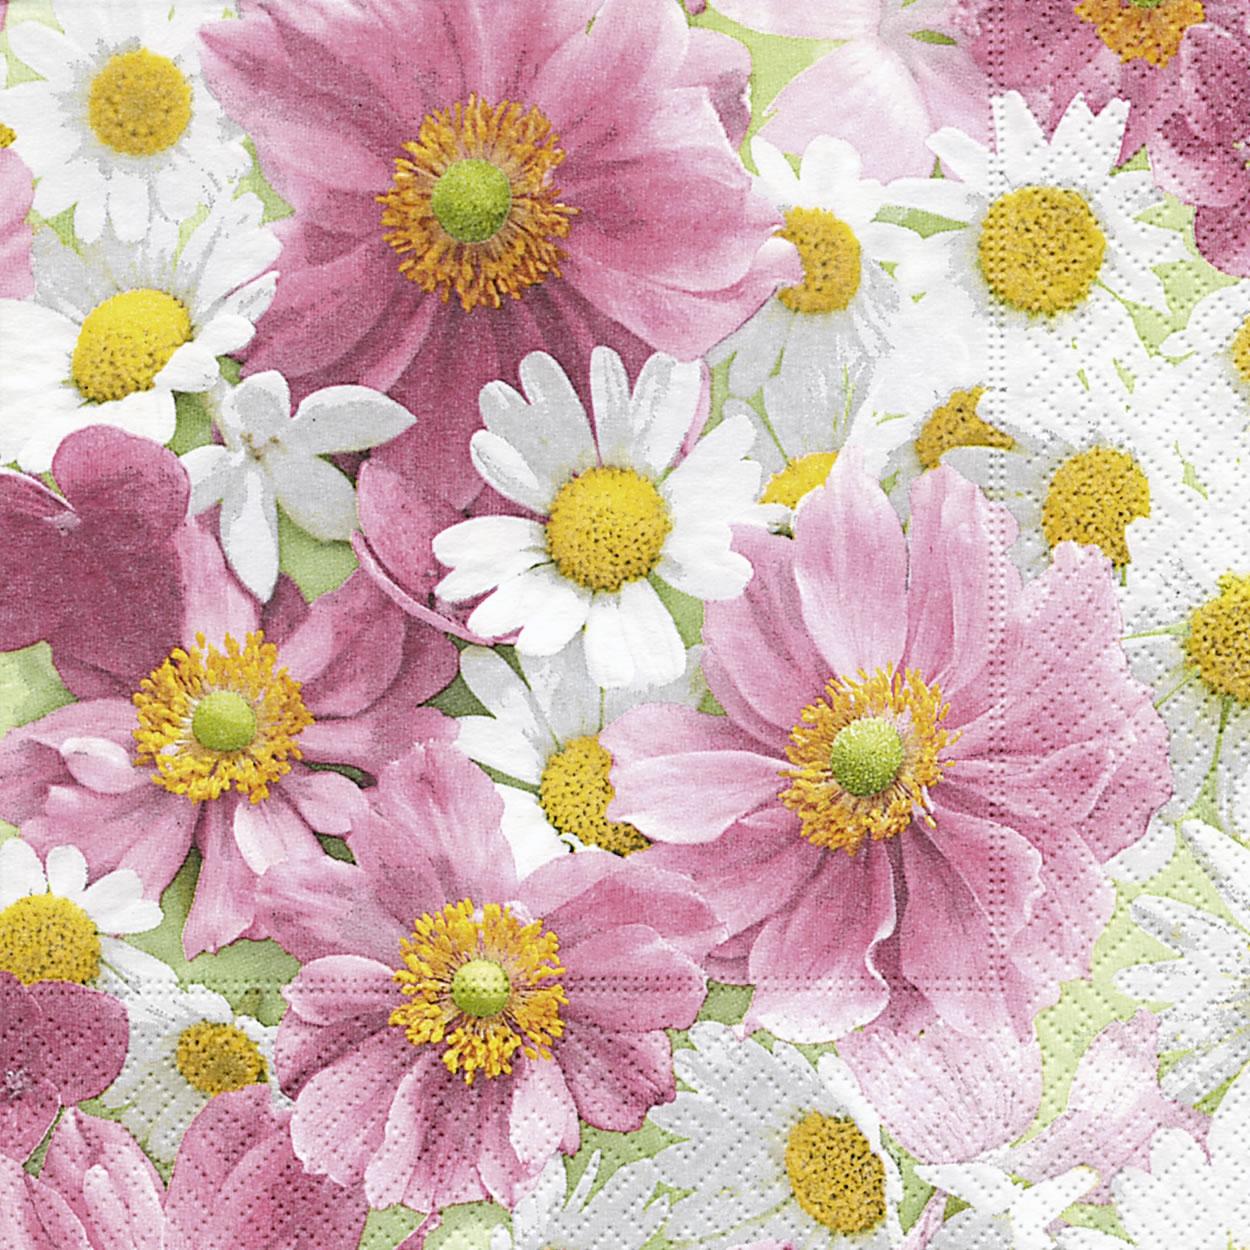 Lunch Servietten Blossom carpet,  Blumen -  Sonstige,  Blumen - Magariten,  Everyday,  lunchservietten,  Blumen